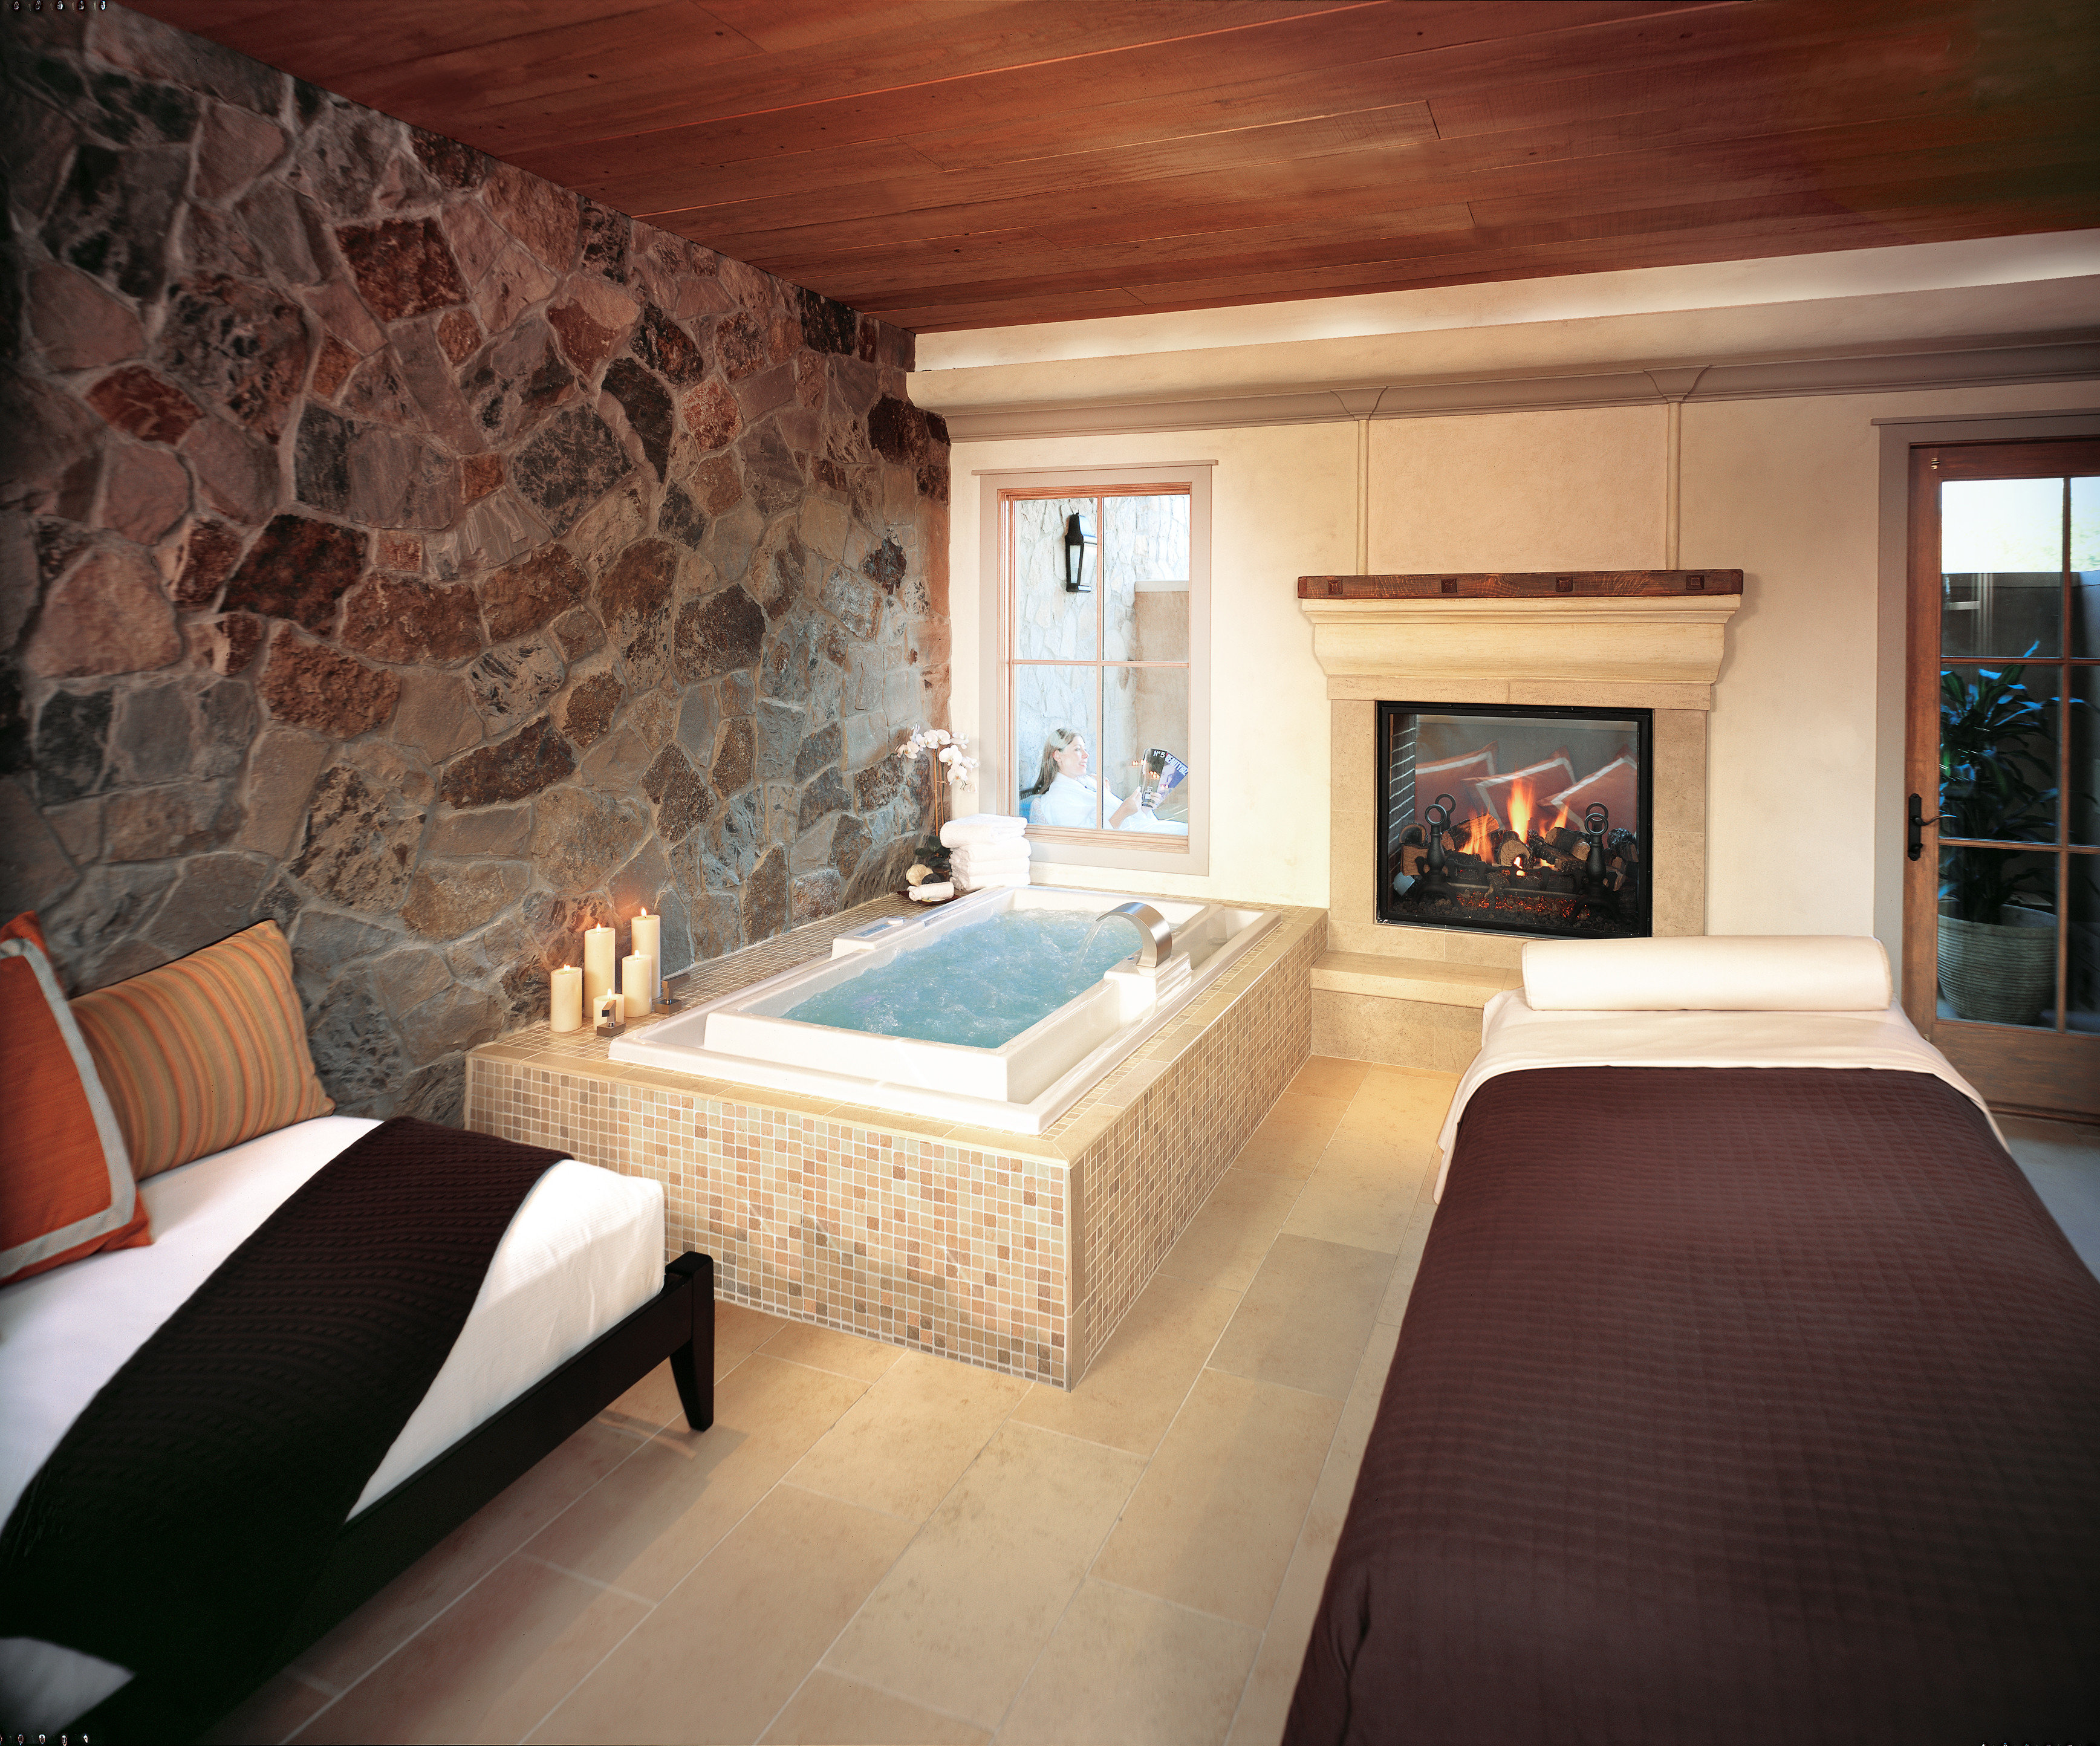 Bath Hotels Luxury Romance Spa Spa Retreats Trip Ideas sofa property house Fireplace living room home hardwood cottage Suite stone wood flooring mansion